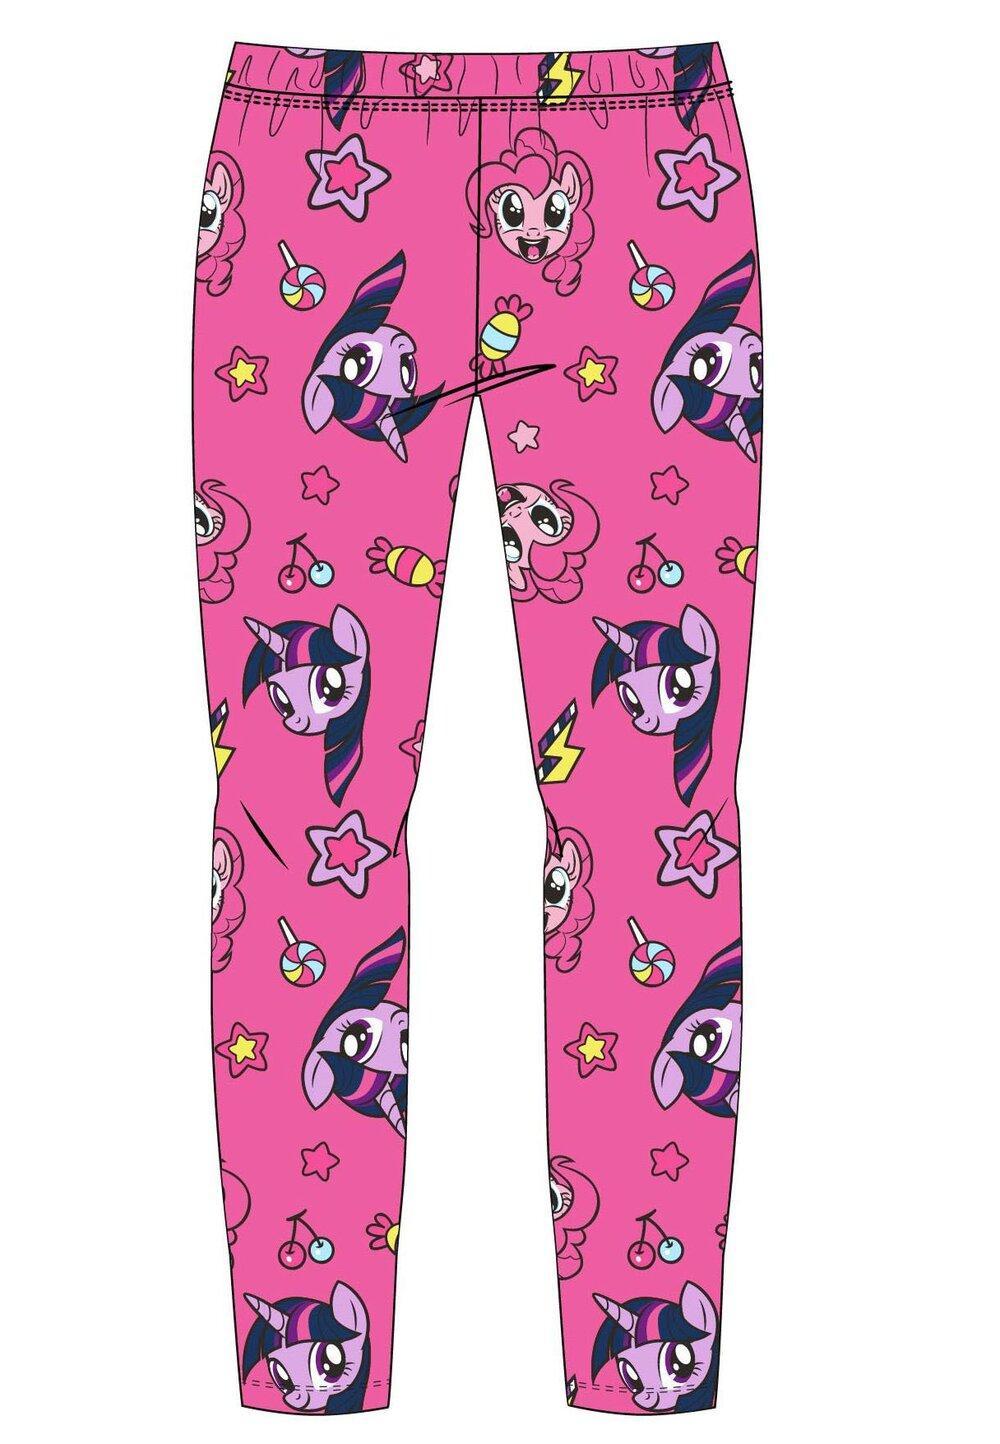 Colanti, Pinkie Pie si Twilight Sparkle, roz imagine